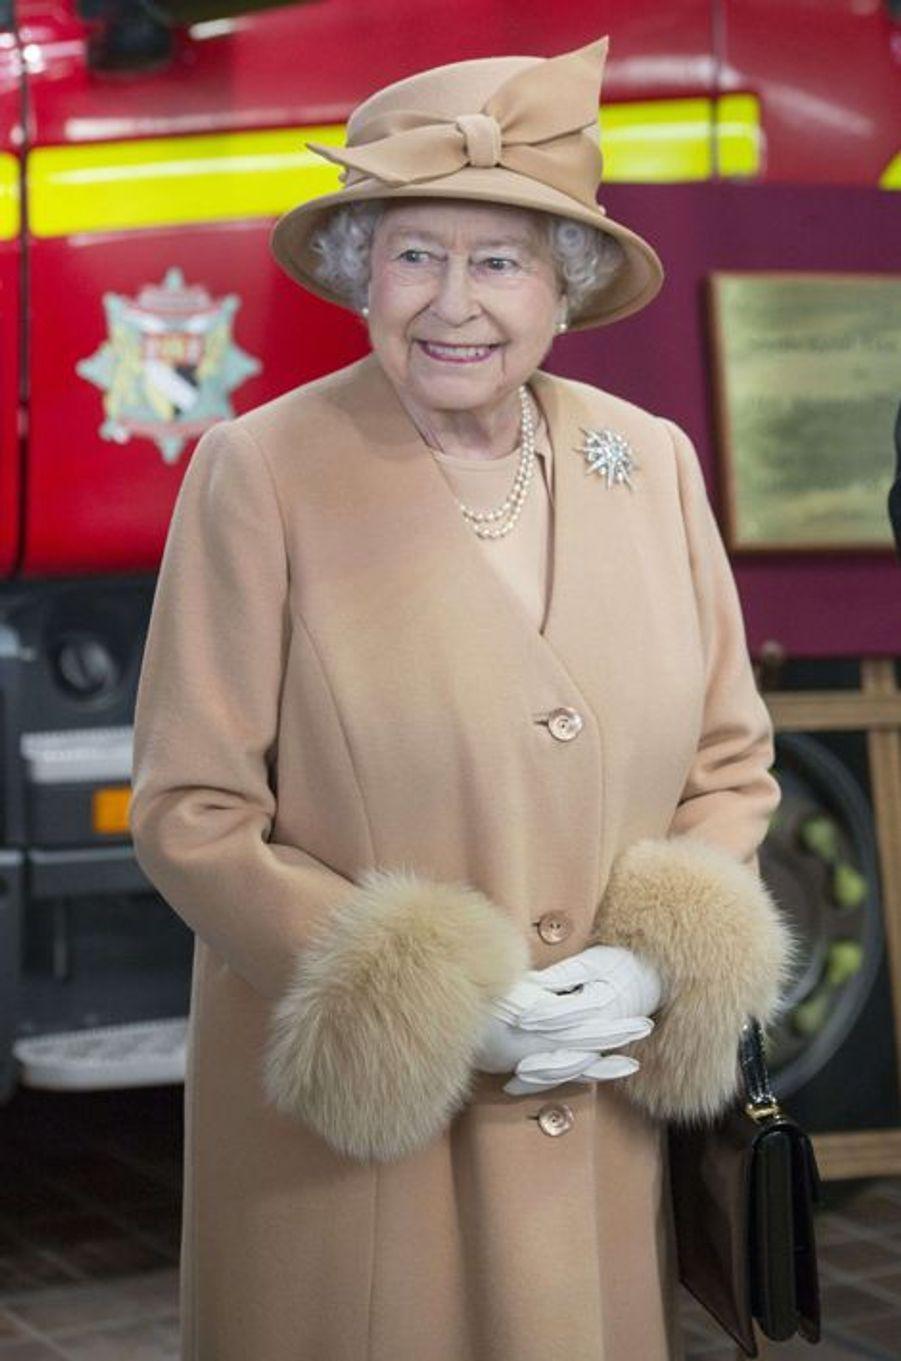 La reine Elizabeth II inaugure la caserne de pompiers à King's Lynn, le 2 février 2015